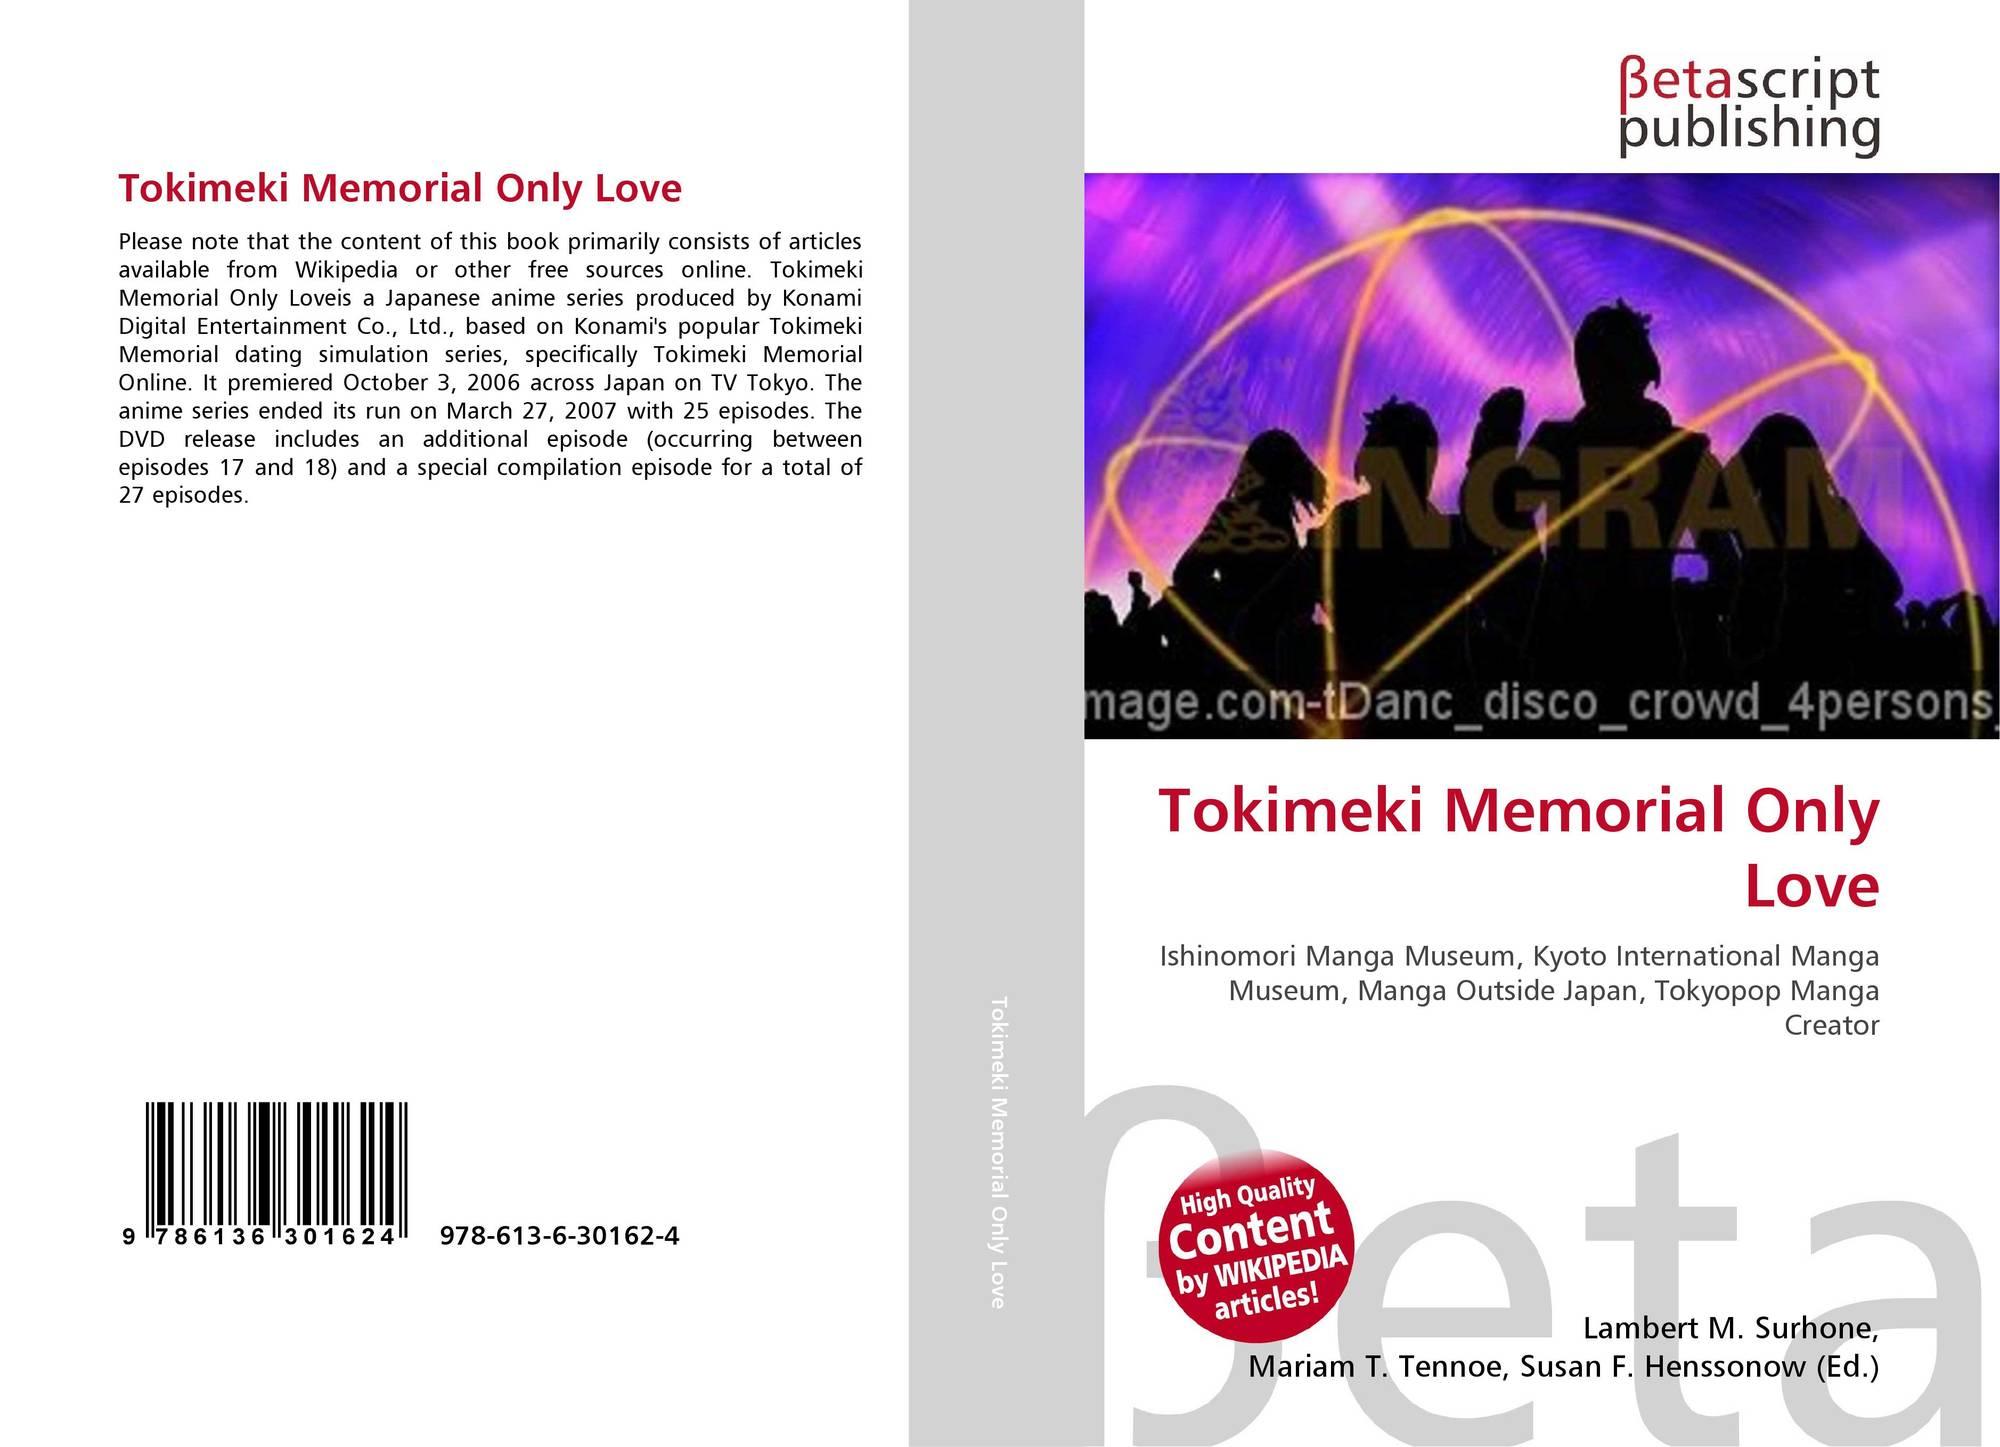 Tokimeki Memorial Only Love 978 613 6 30162 4 6136301628